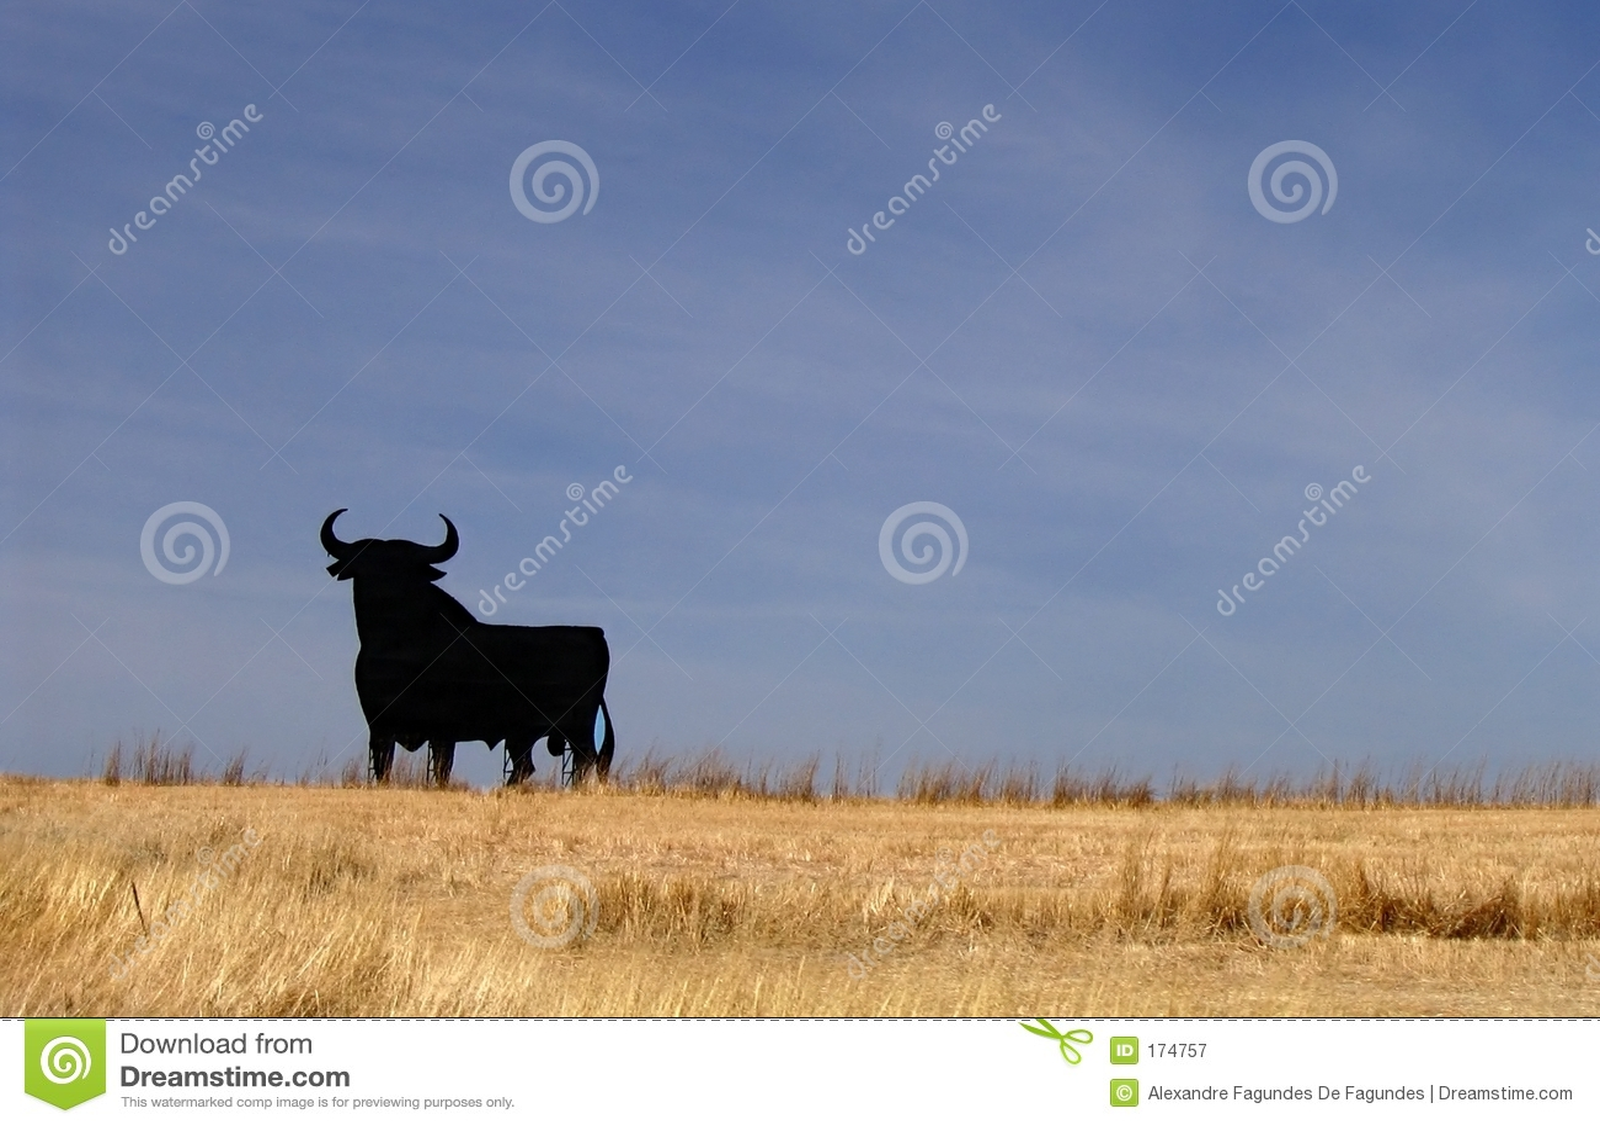 Download Bull Spain stock image. Image of spain, yellow, road, wheat - 174757